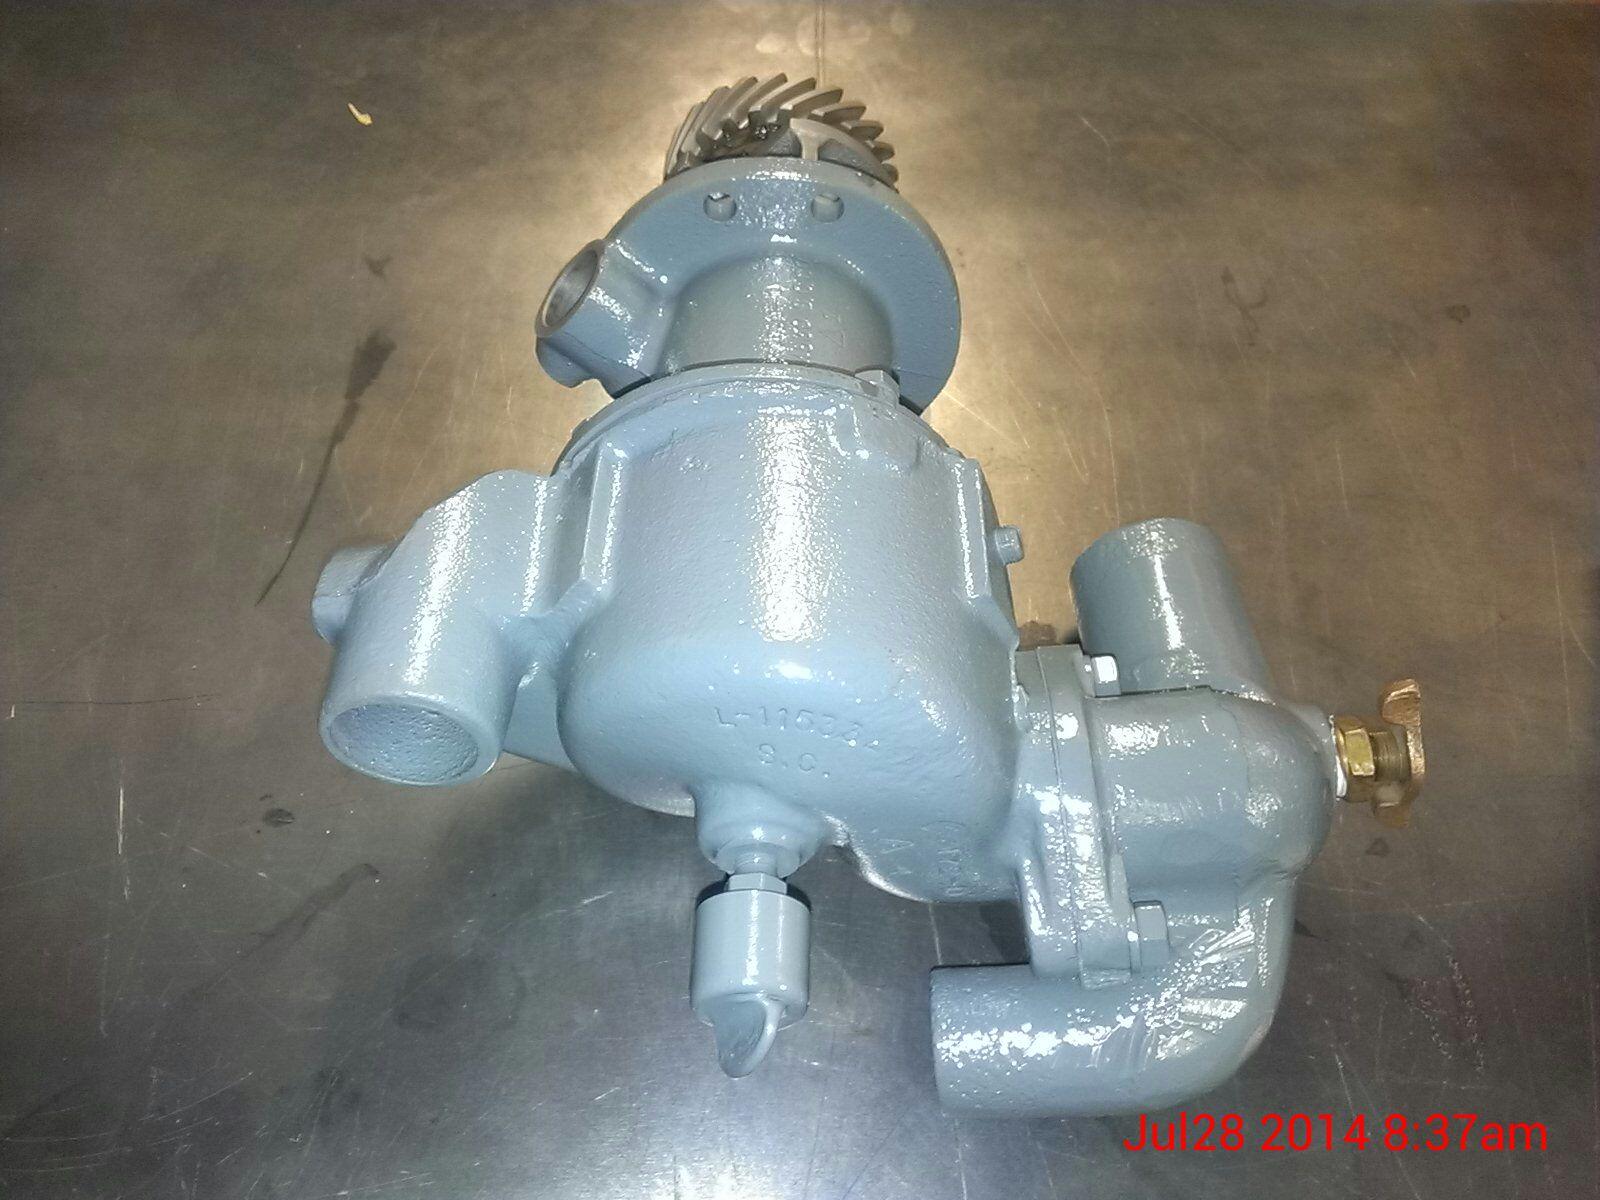 Hercules Model JXLD Water Pump Machining, Rebuild